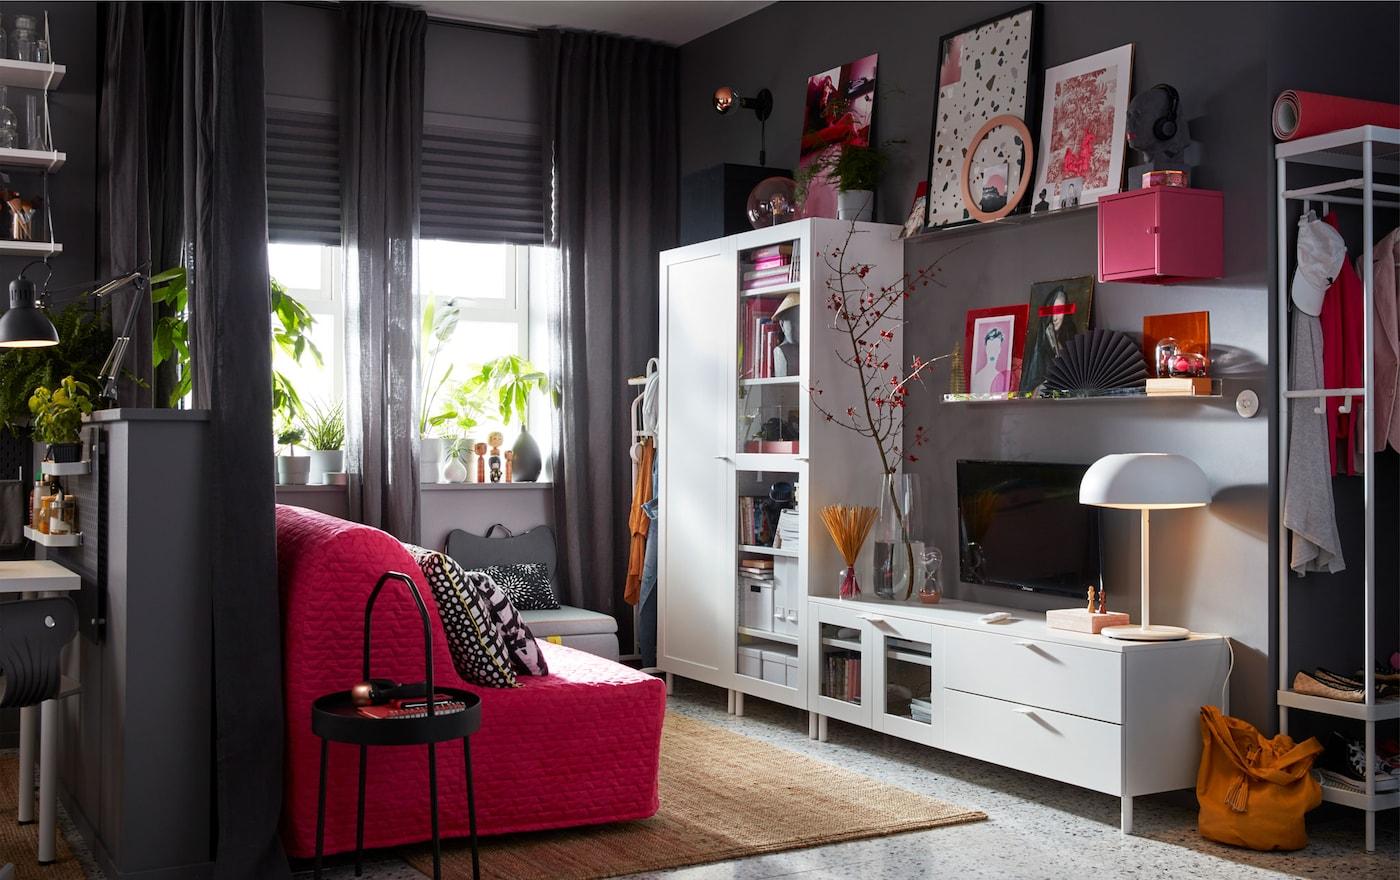 Dekorasi Deco Ruang Tamu Kecil Ikea